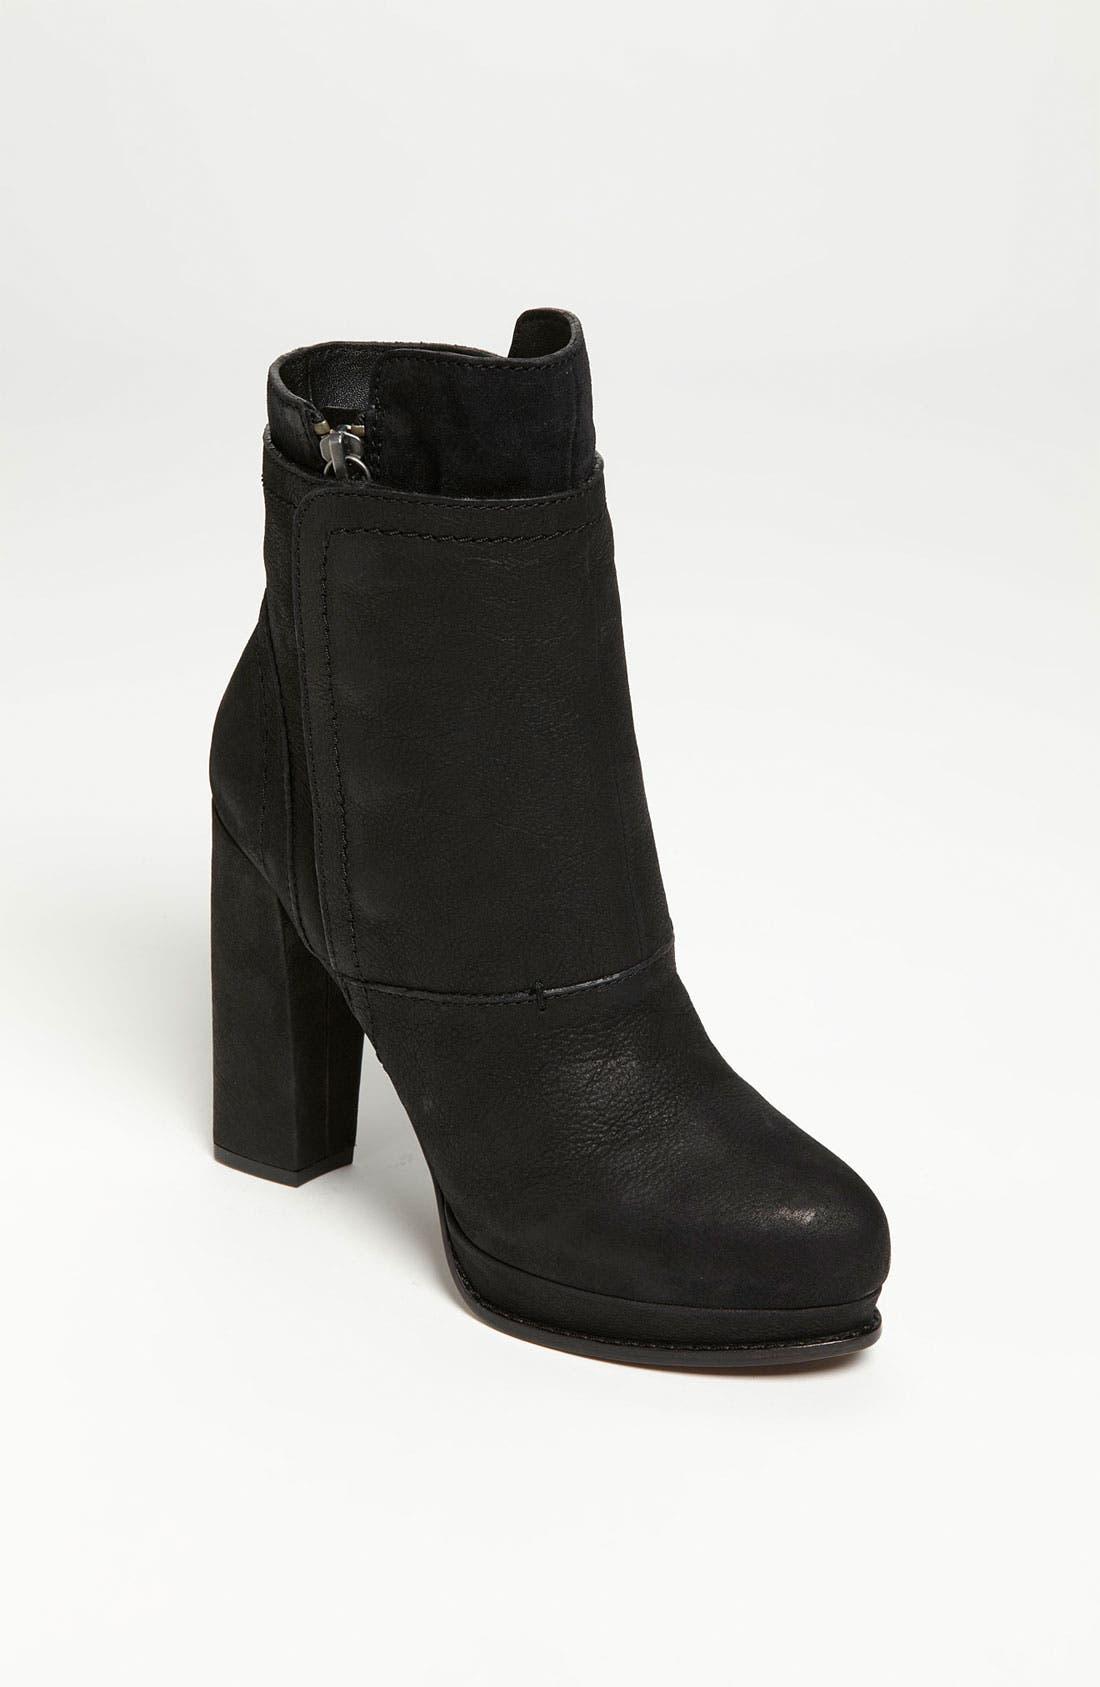 Alternate Image 1 Selected - Vera Wang Footwear 'Marilyn' Boot